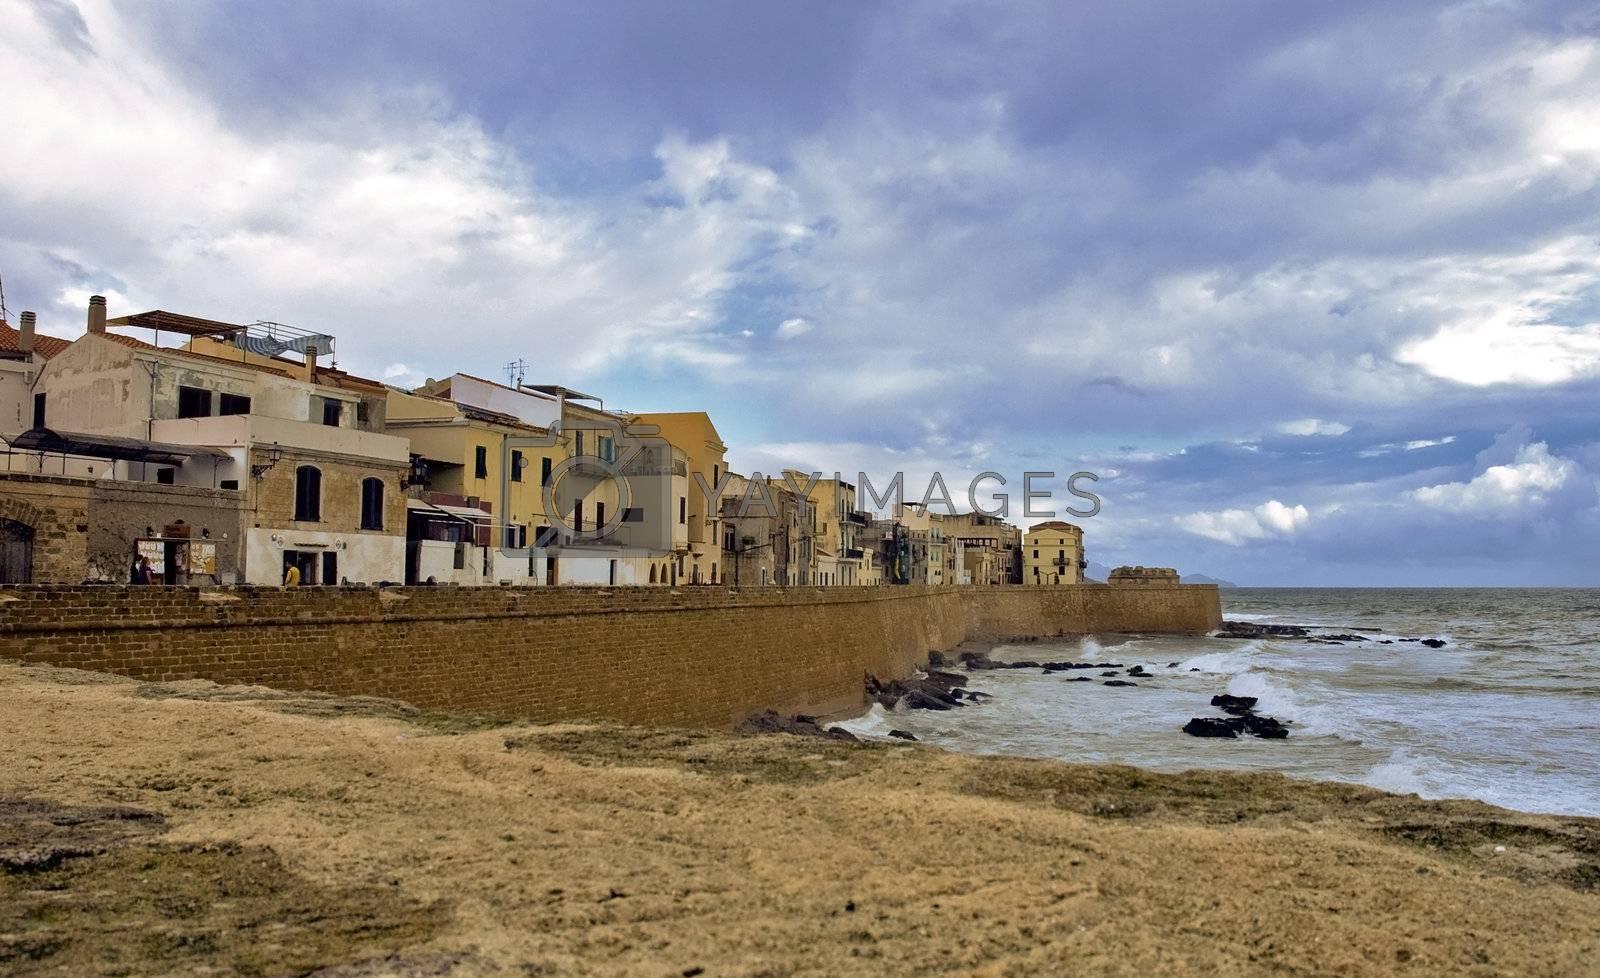 Royalty free image of Alghero 2 by carla720